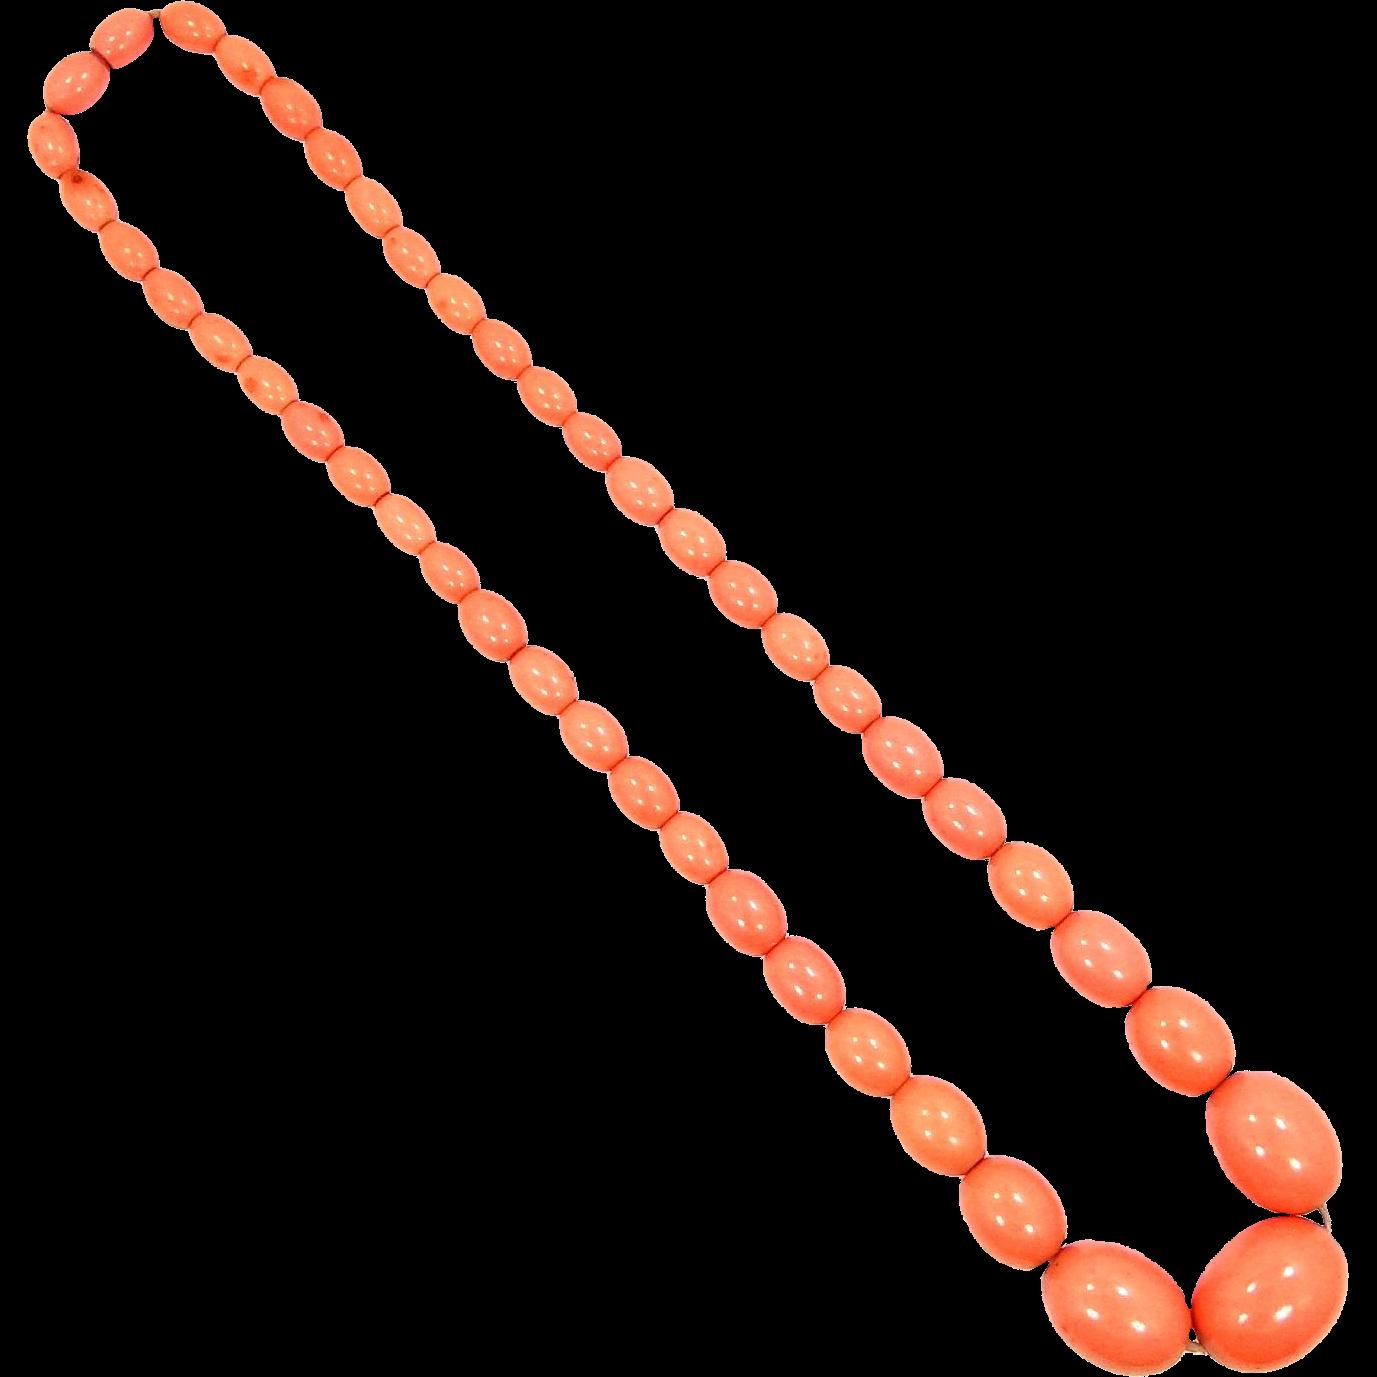 Vintage Celluloid Necklace in Rich Coral Color